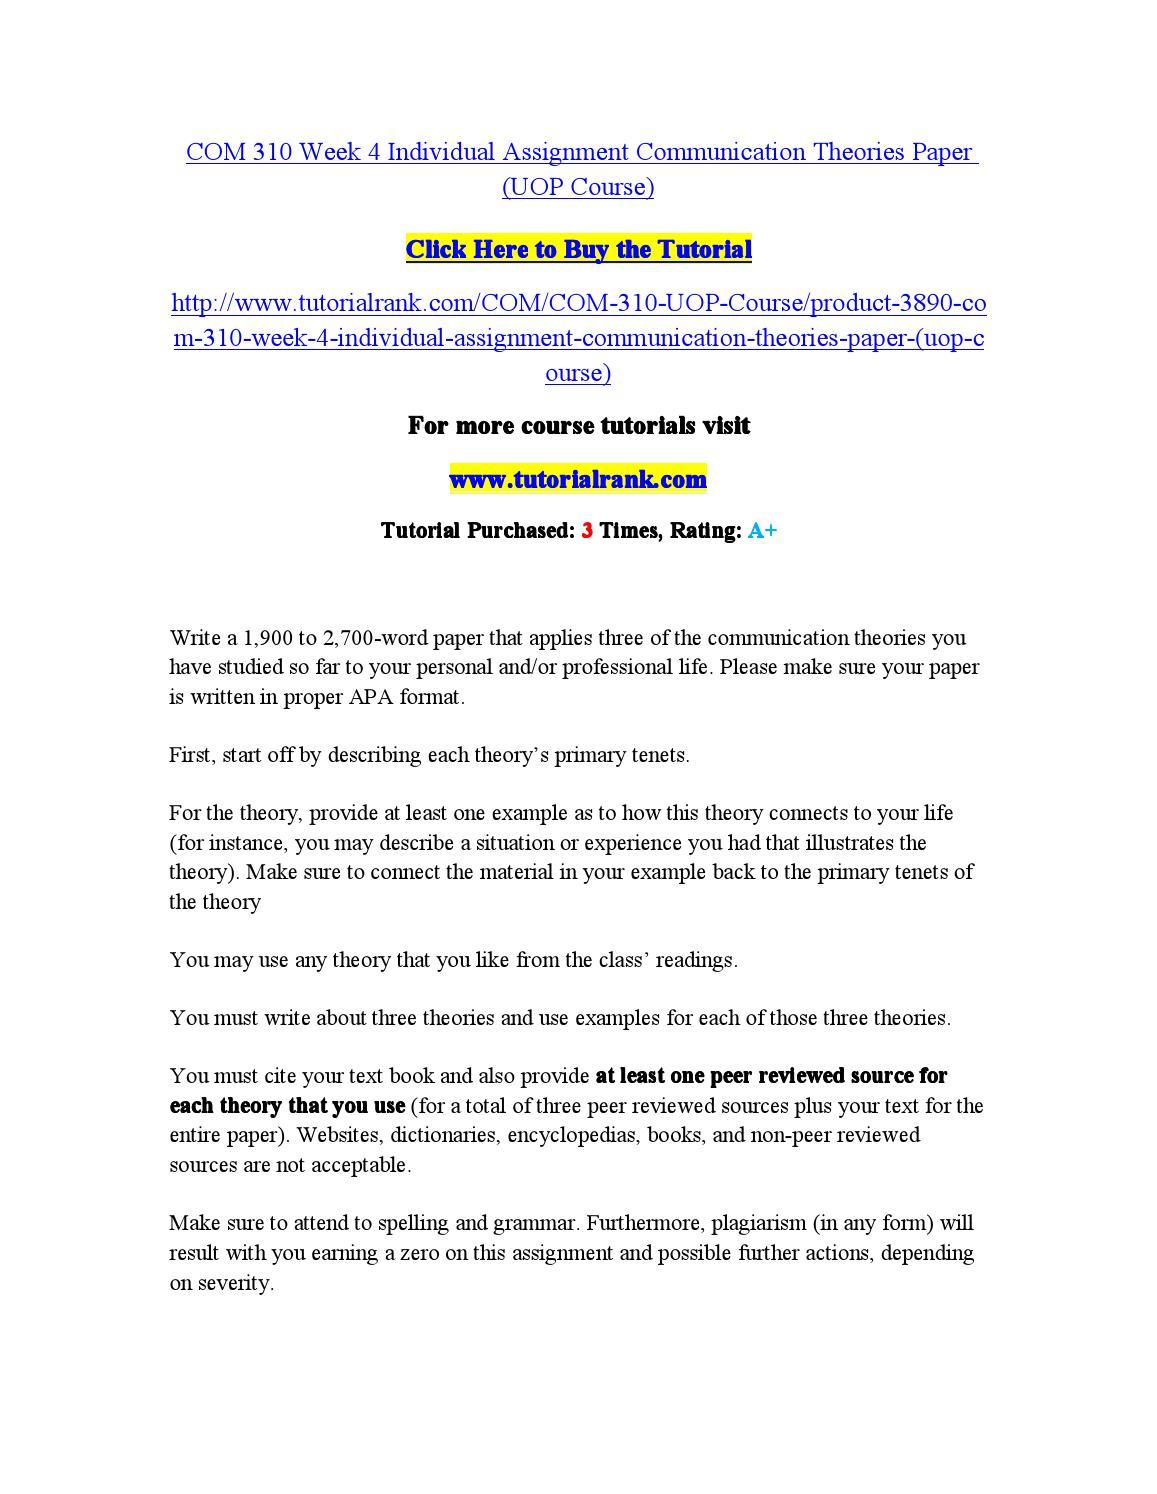 Com310 communications theory paper